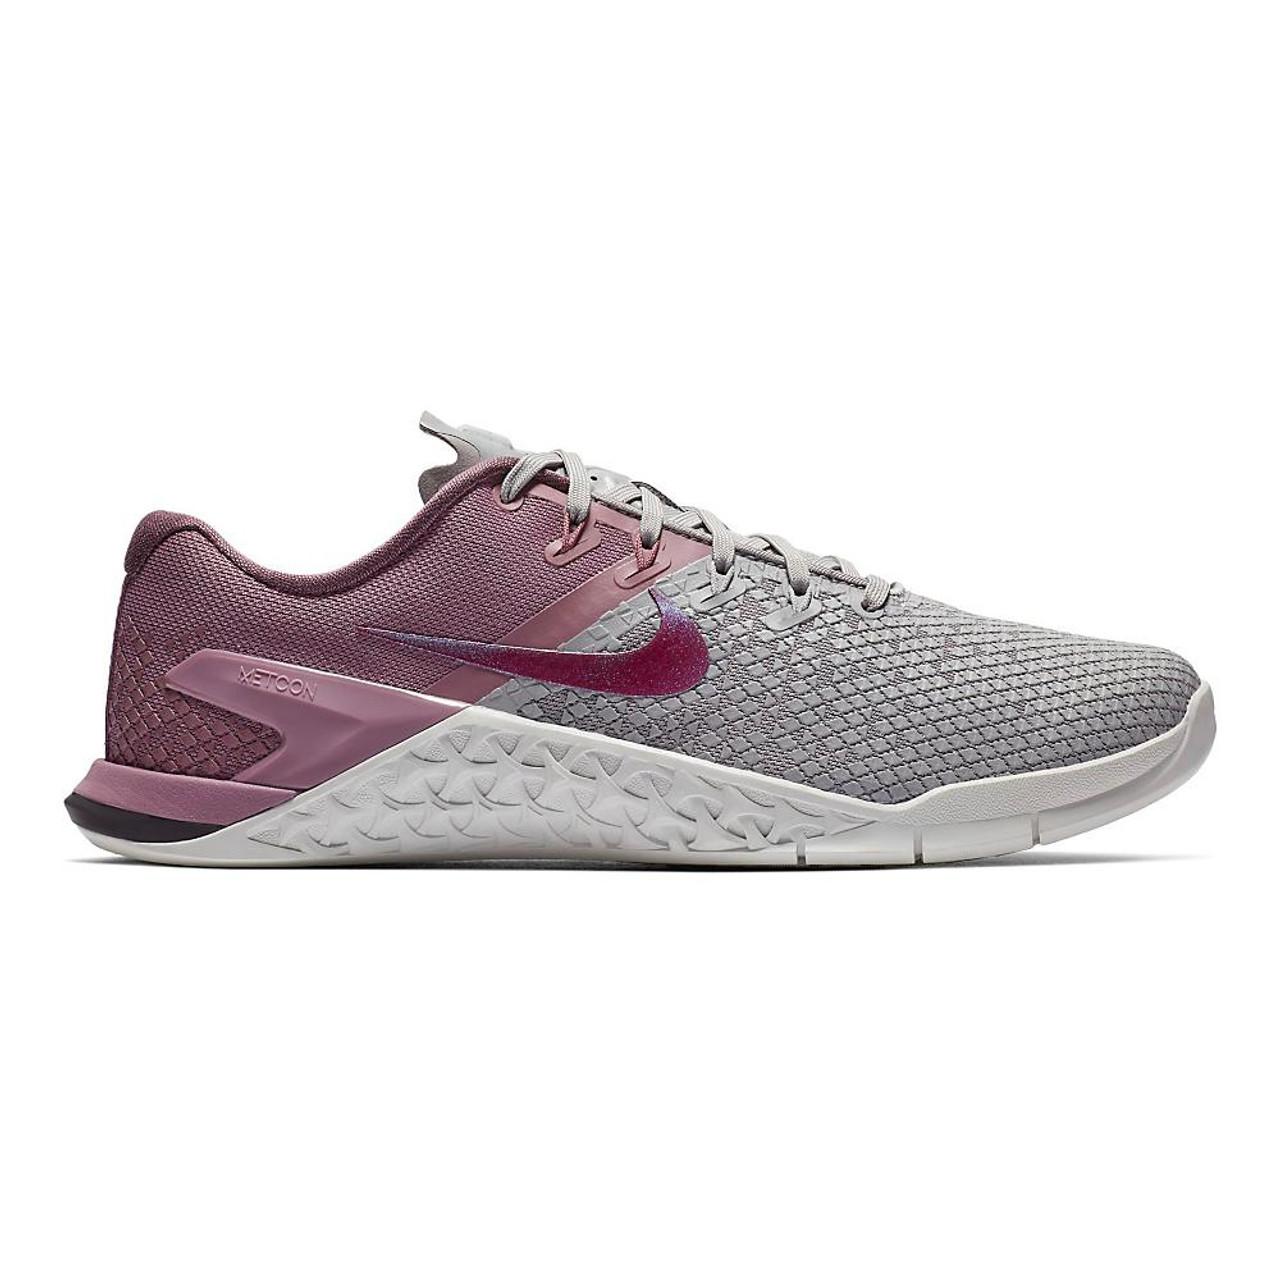 Women's Nike Metcon 4 XD | Free Shipping